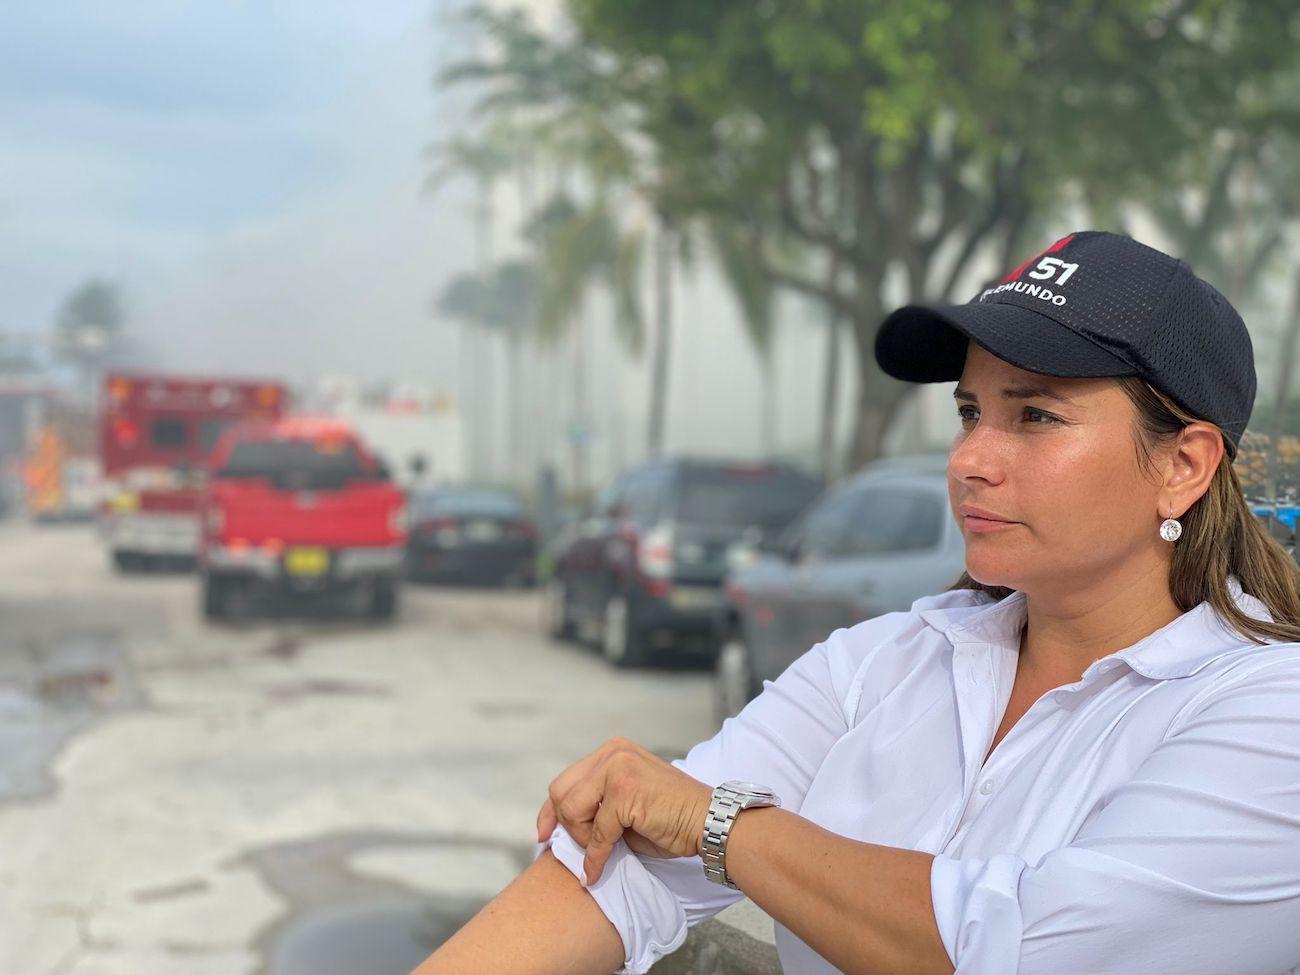 La periodista Leana Astorga durante la cobertura del colapso del edificio en Surfside, Florida.